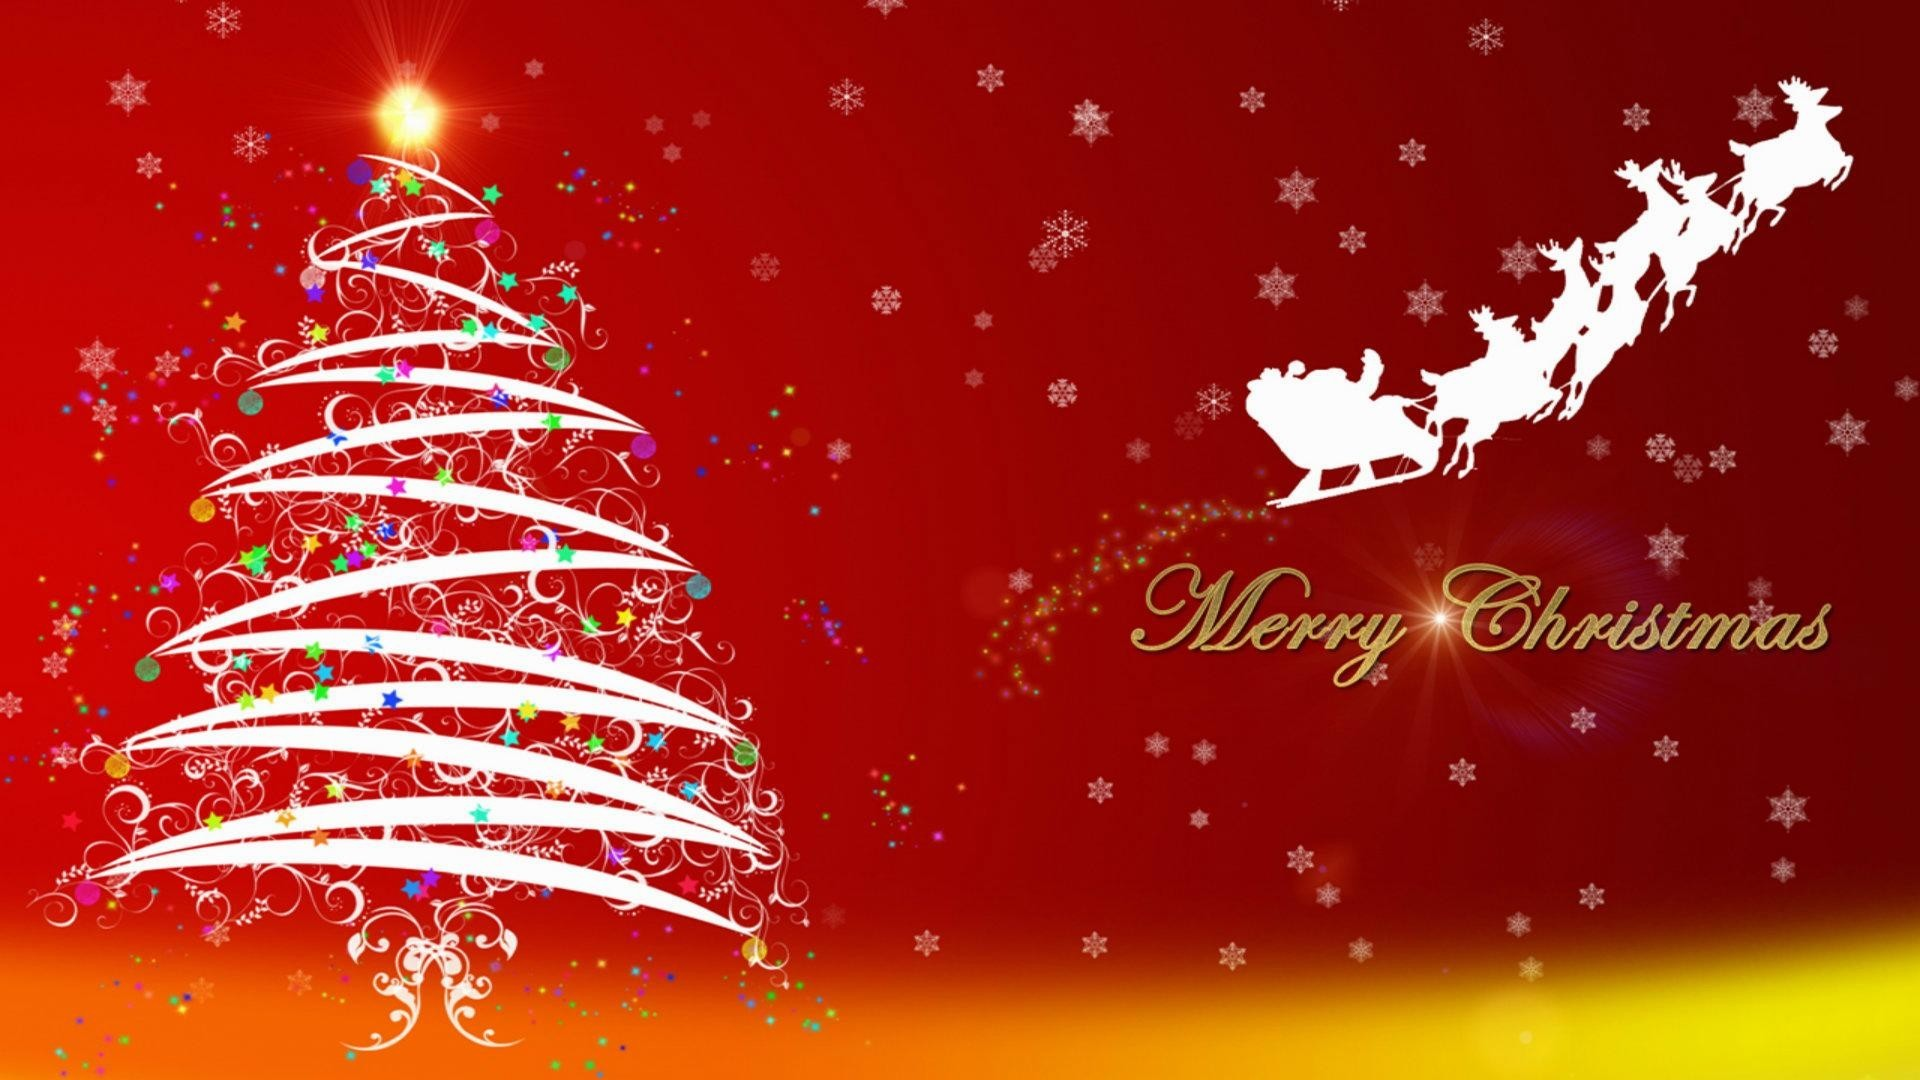 Good Wallpaper High Resolution Christmas - 1184304-popular-christmas-giraffe-wallpaper-1920x1080-for-hd  Perfect Image Reference_16732.jpg